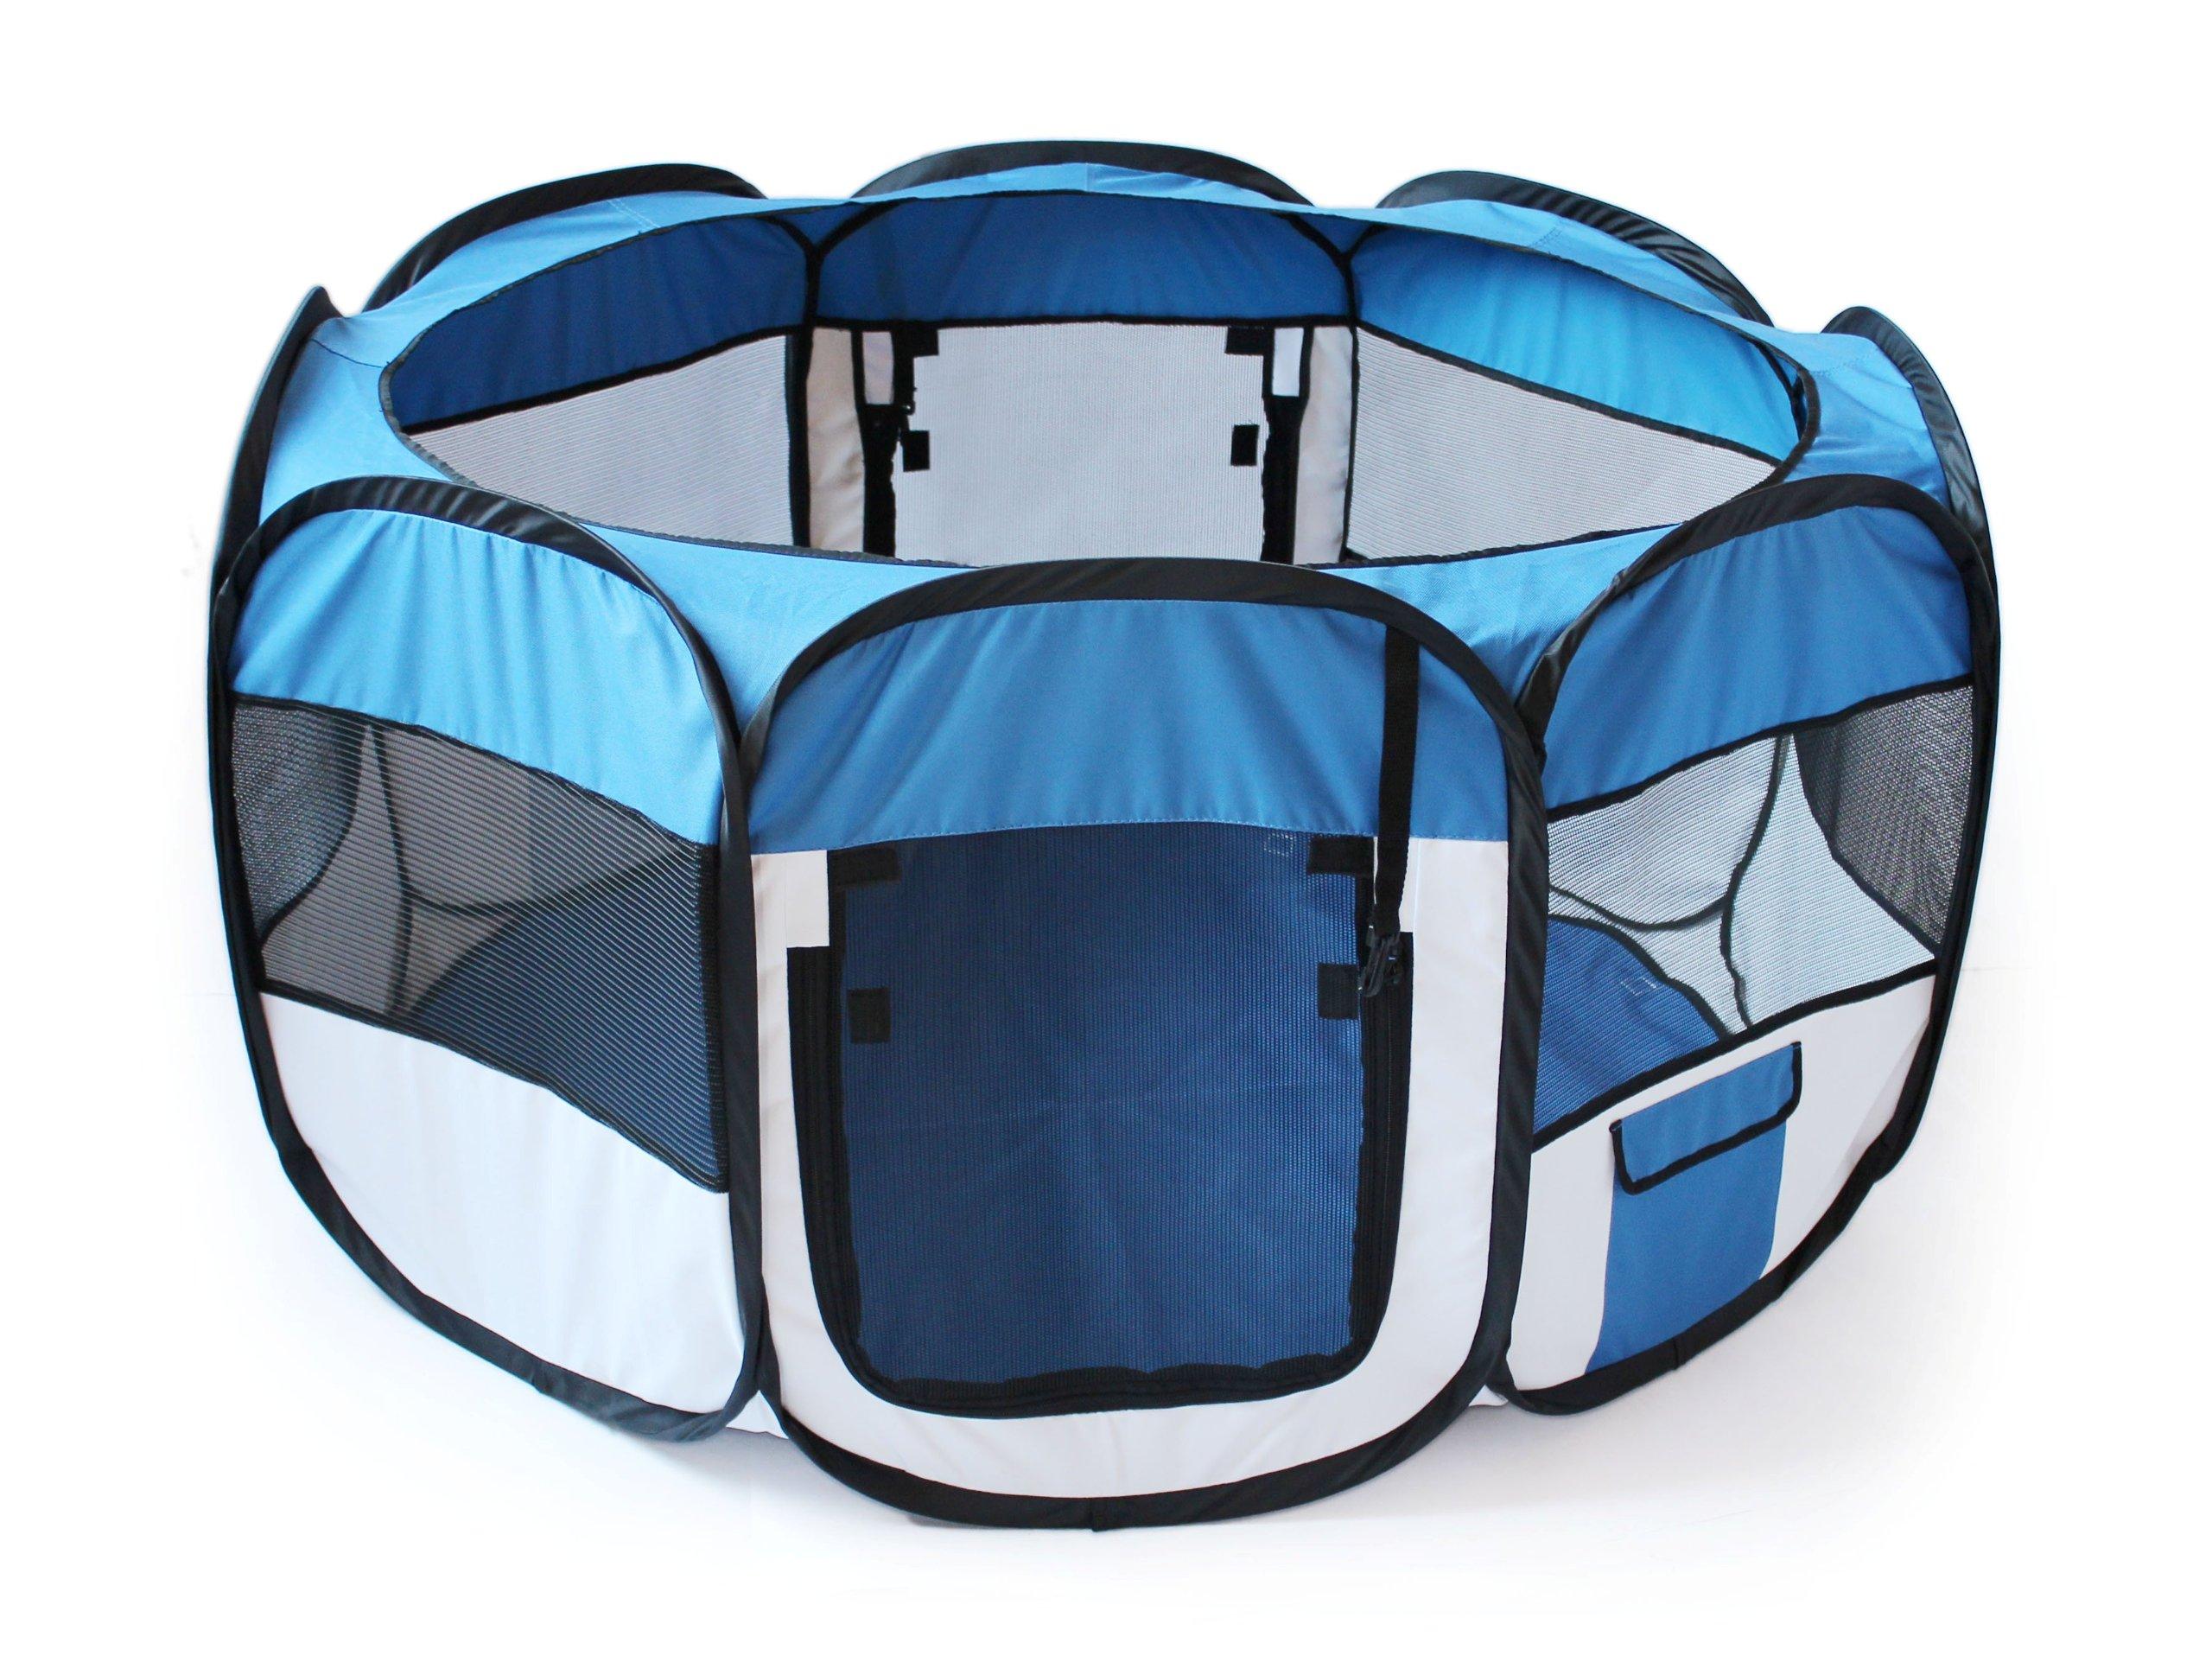 ALLMAX Folding Pet Playpen, Blue